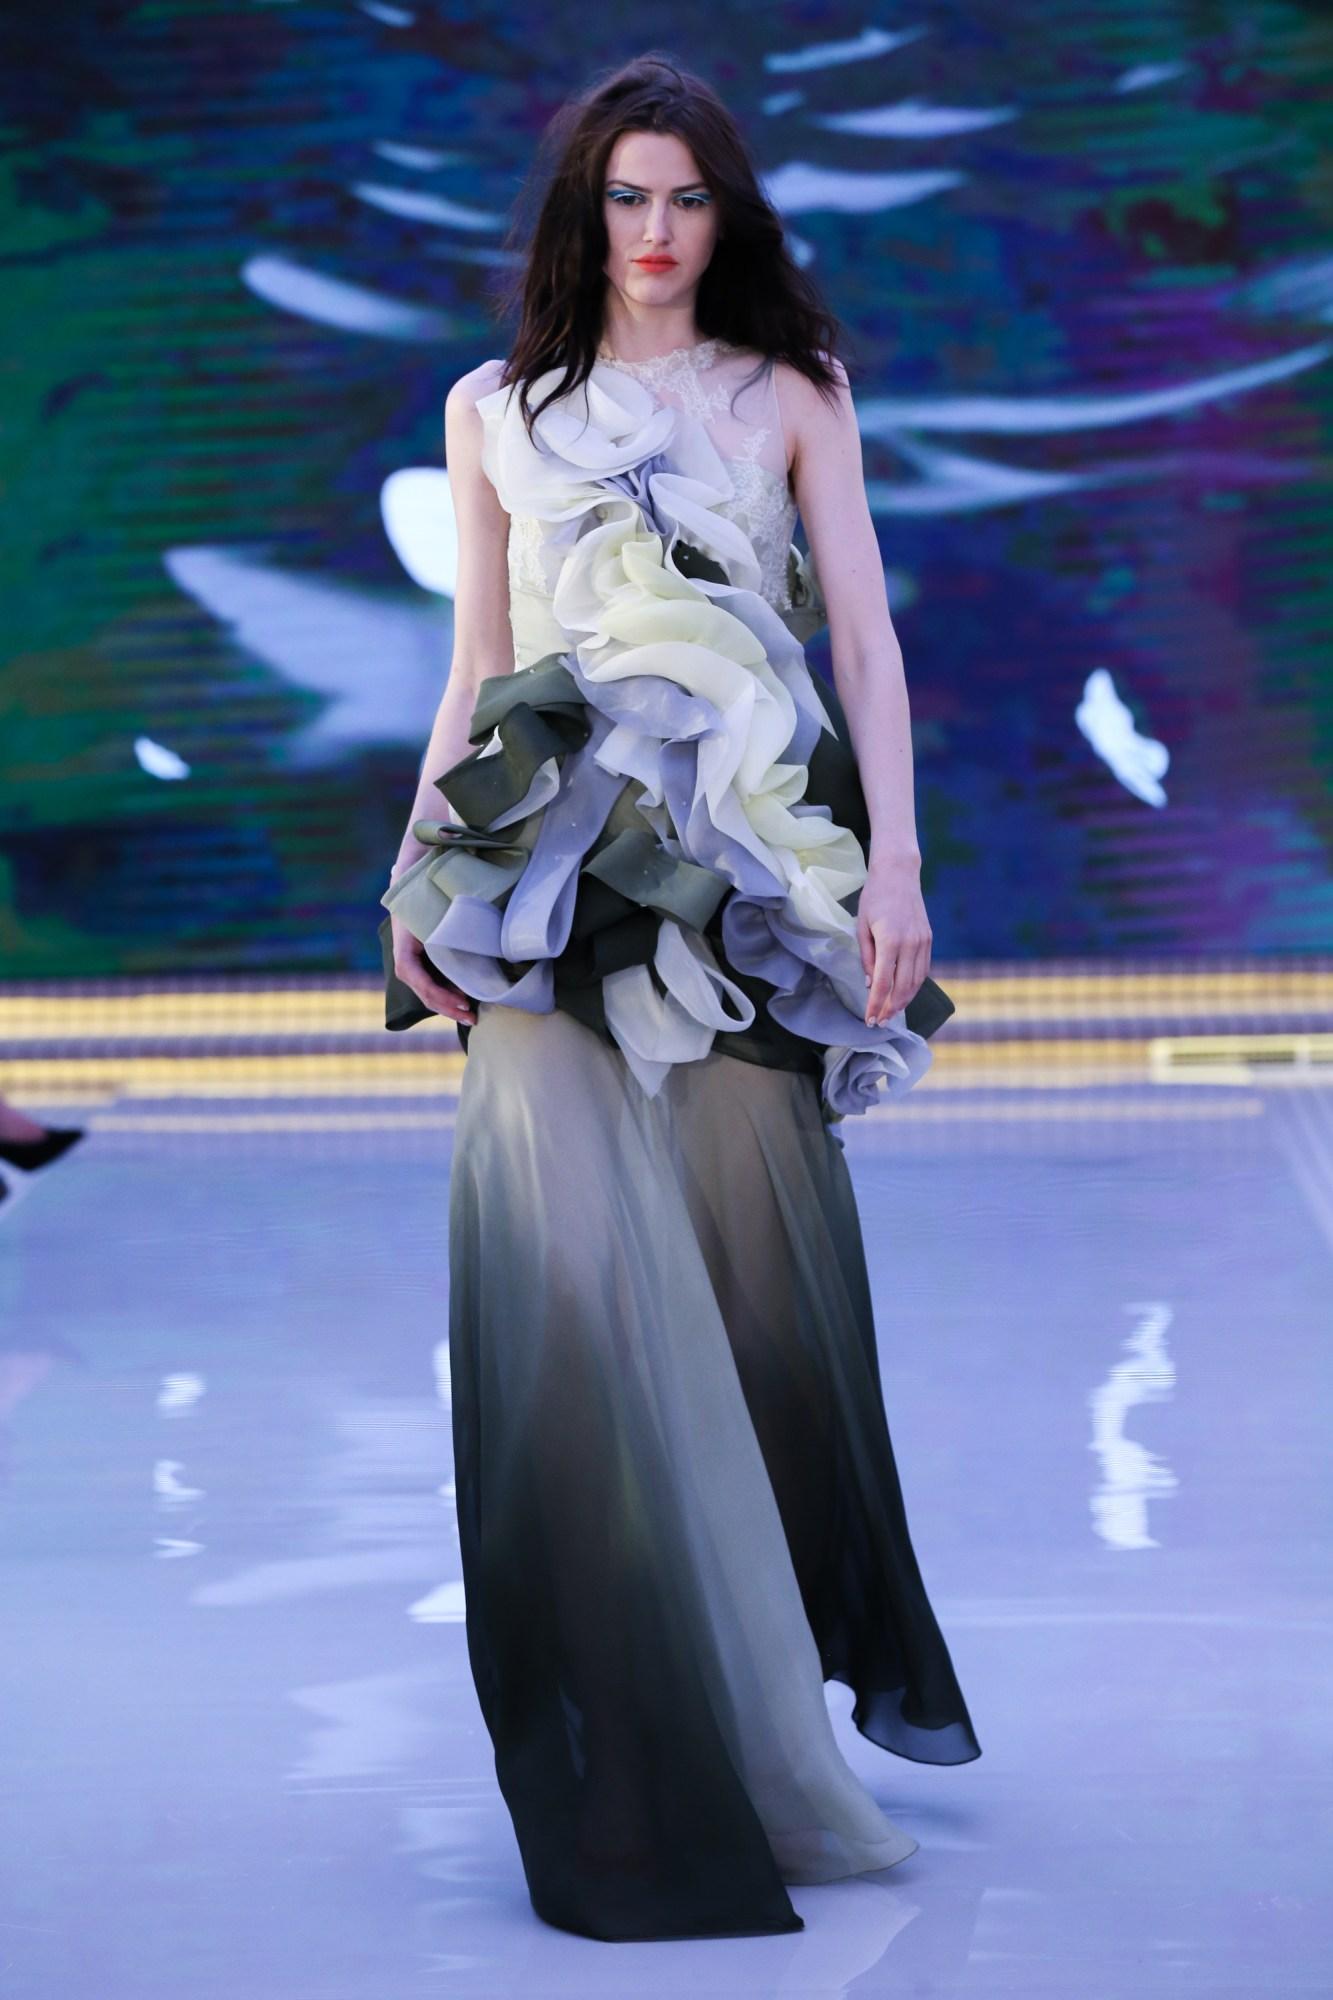 Jordy Fu Resort 2018 Collection Dubai Fashion Week